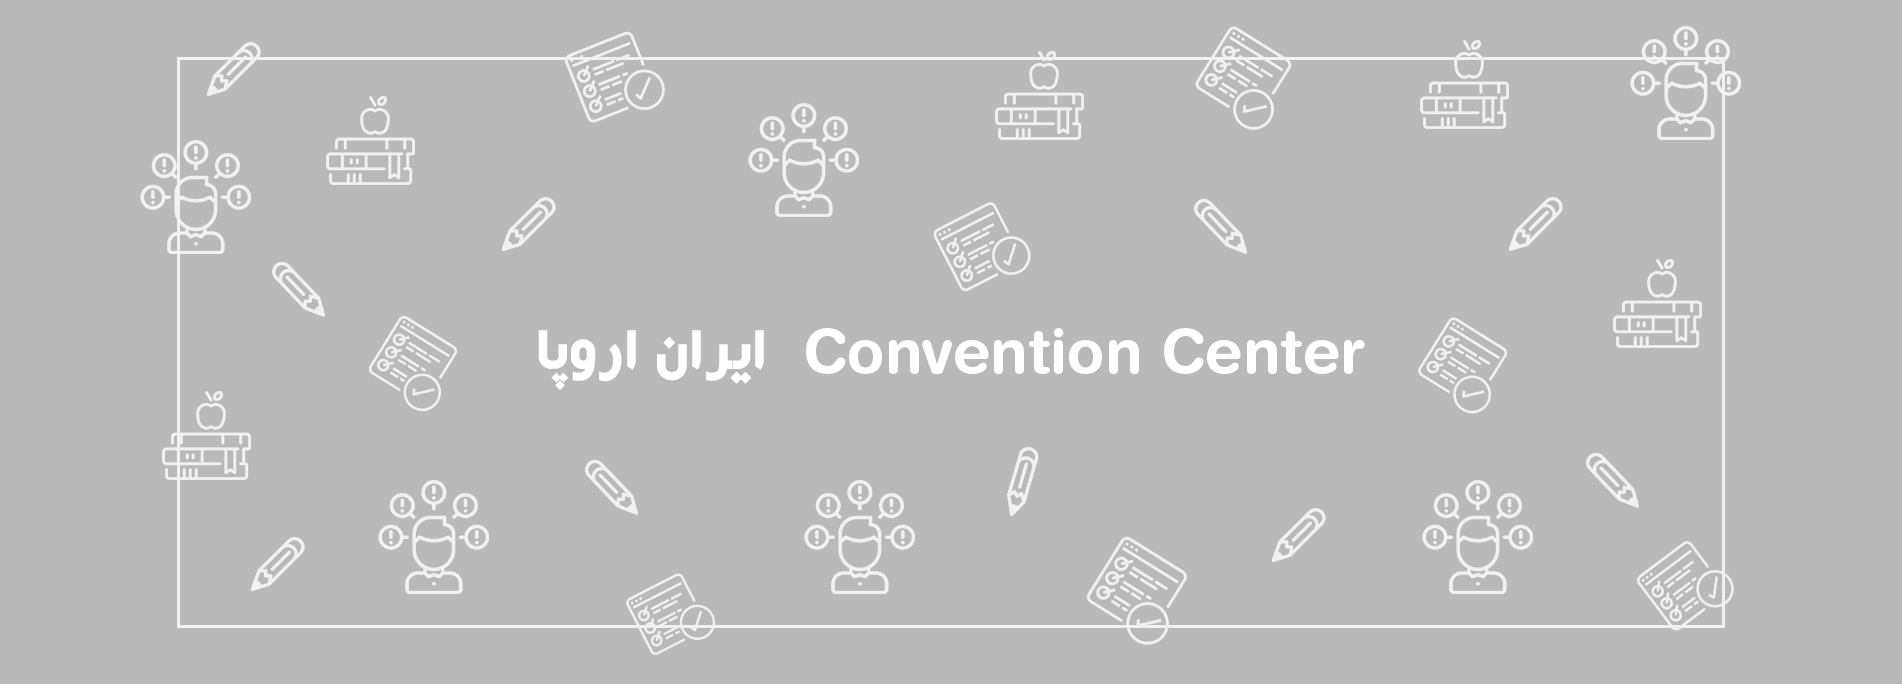 Convention Center ایران اروپا